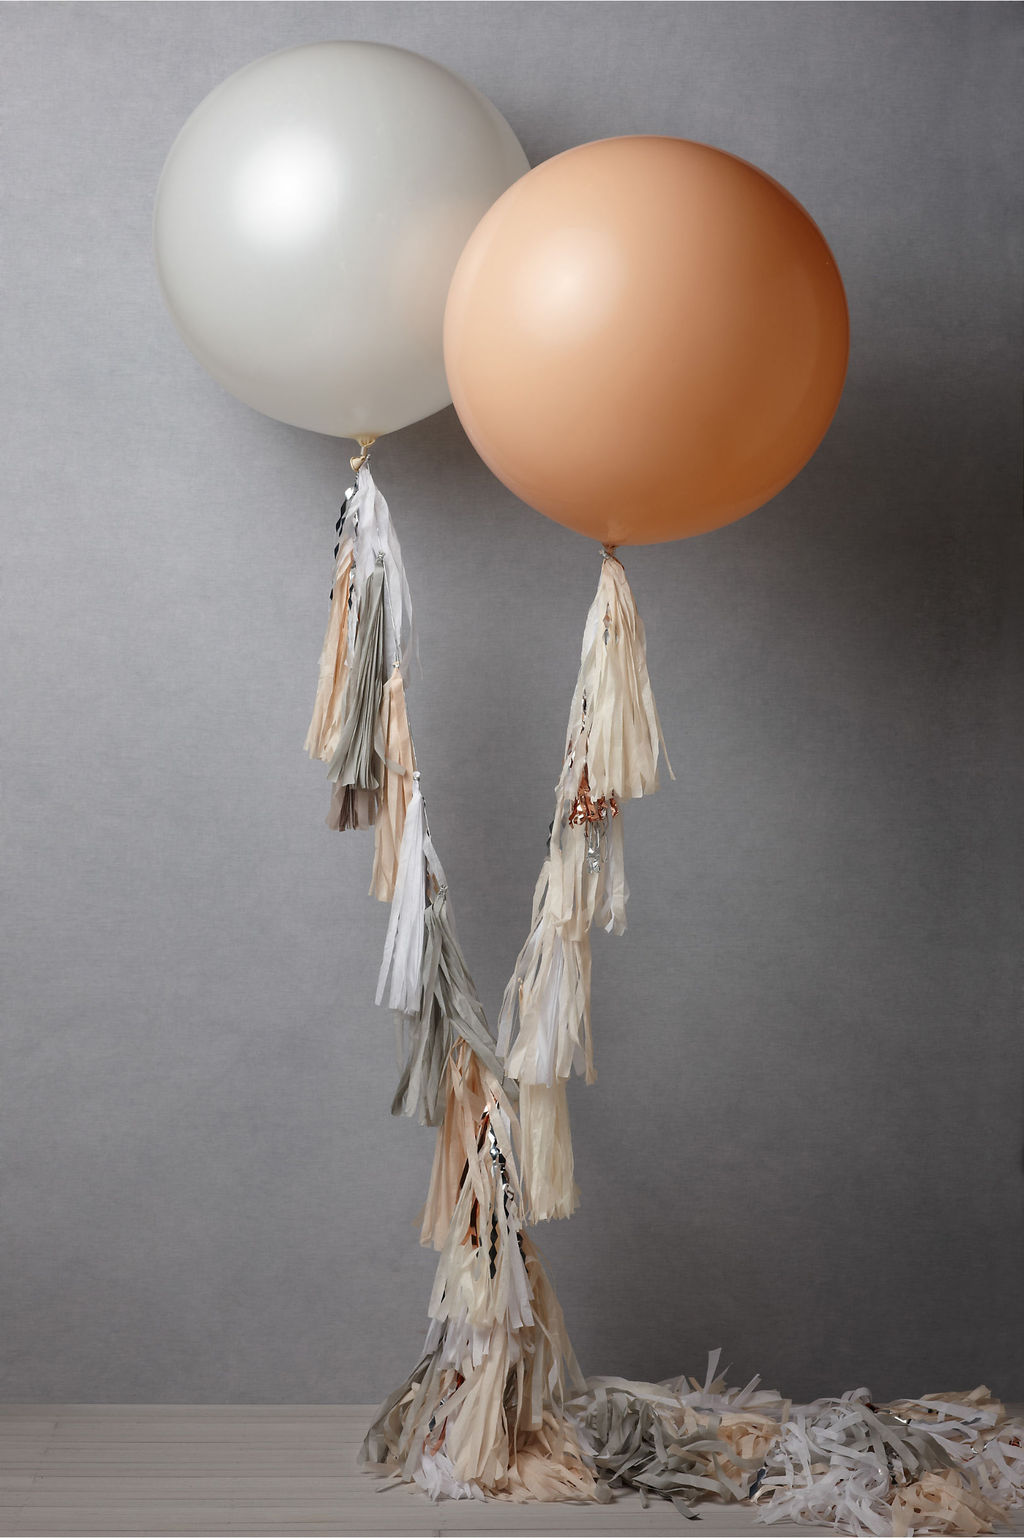 Bhldn-bridal-accessories-for-vintage-weddings-wedding-reception-decor-balloons.full